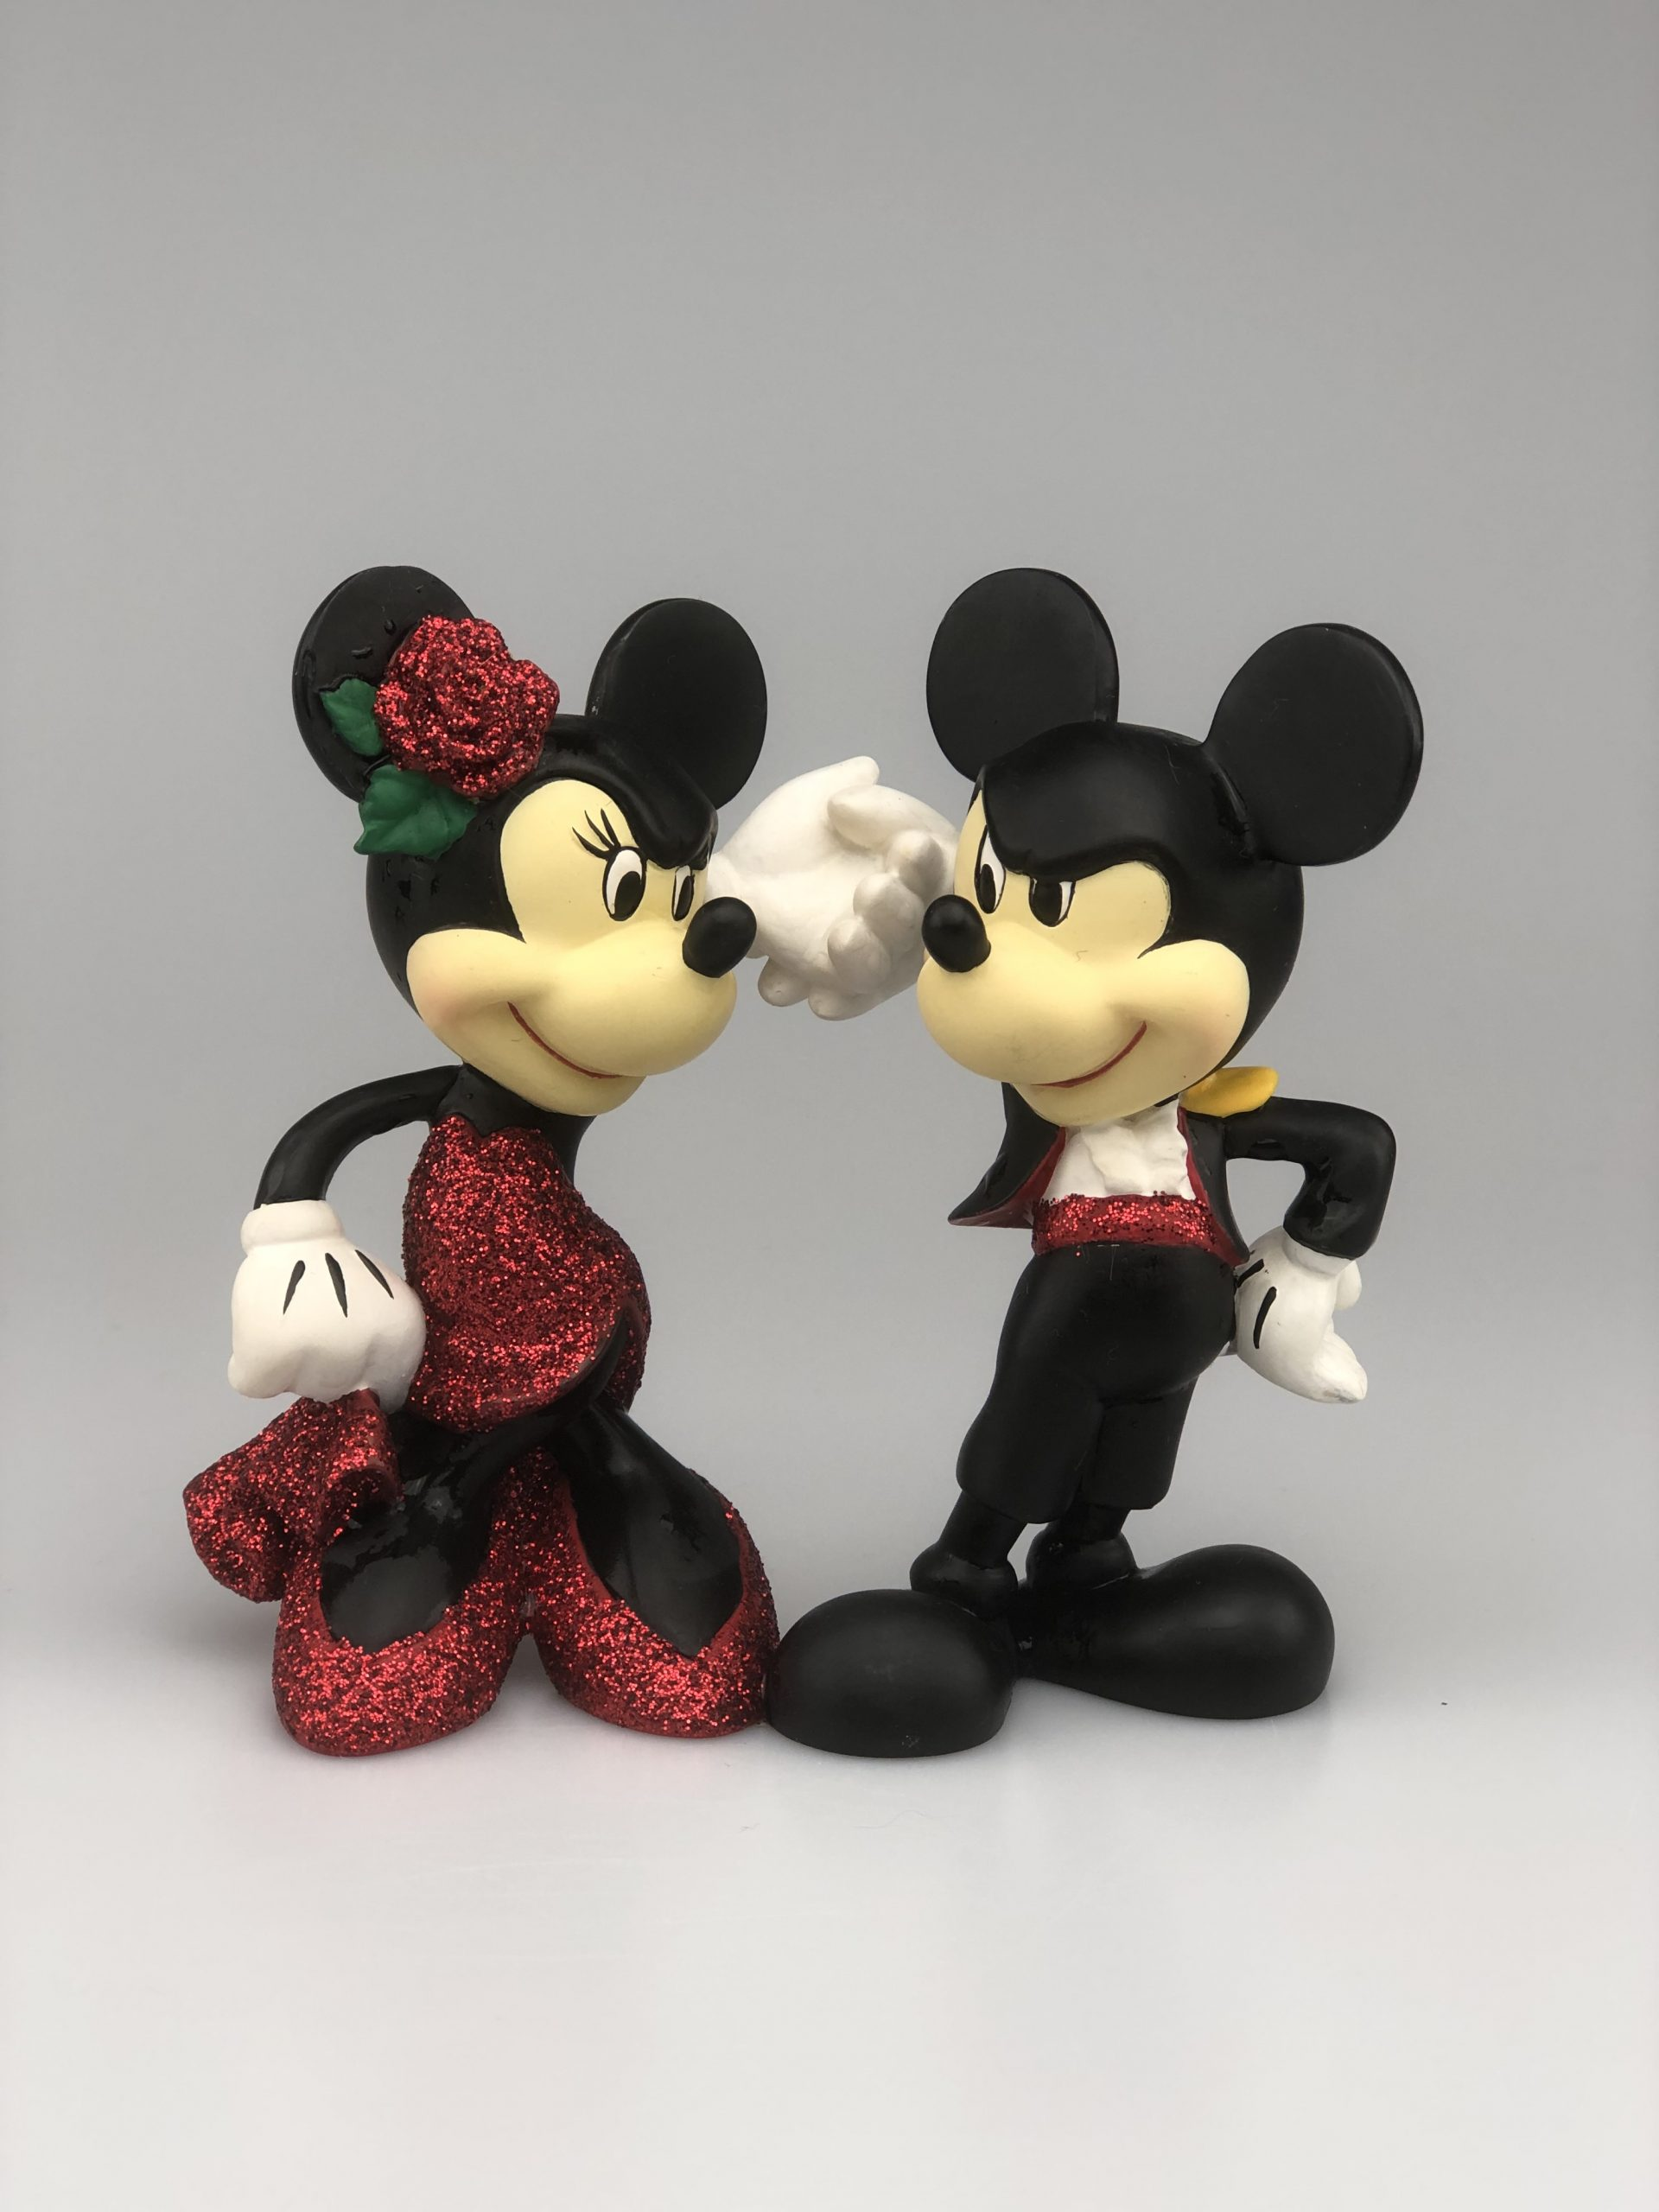 Beeldje Traditions Showcase Mickey & Minnie Paso Doble Handbeschilderd